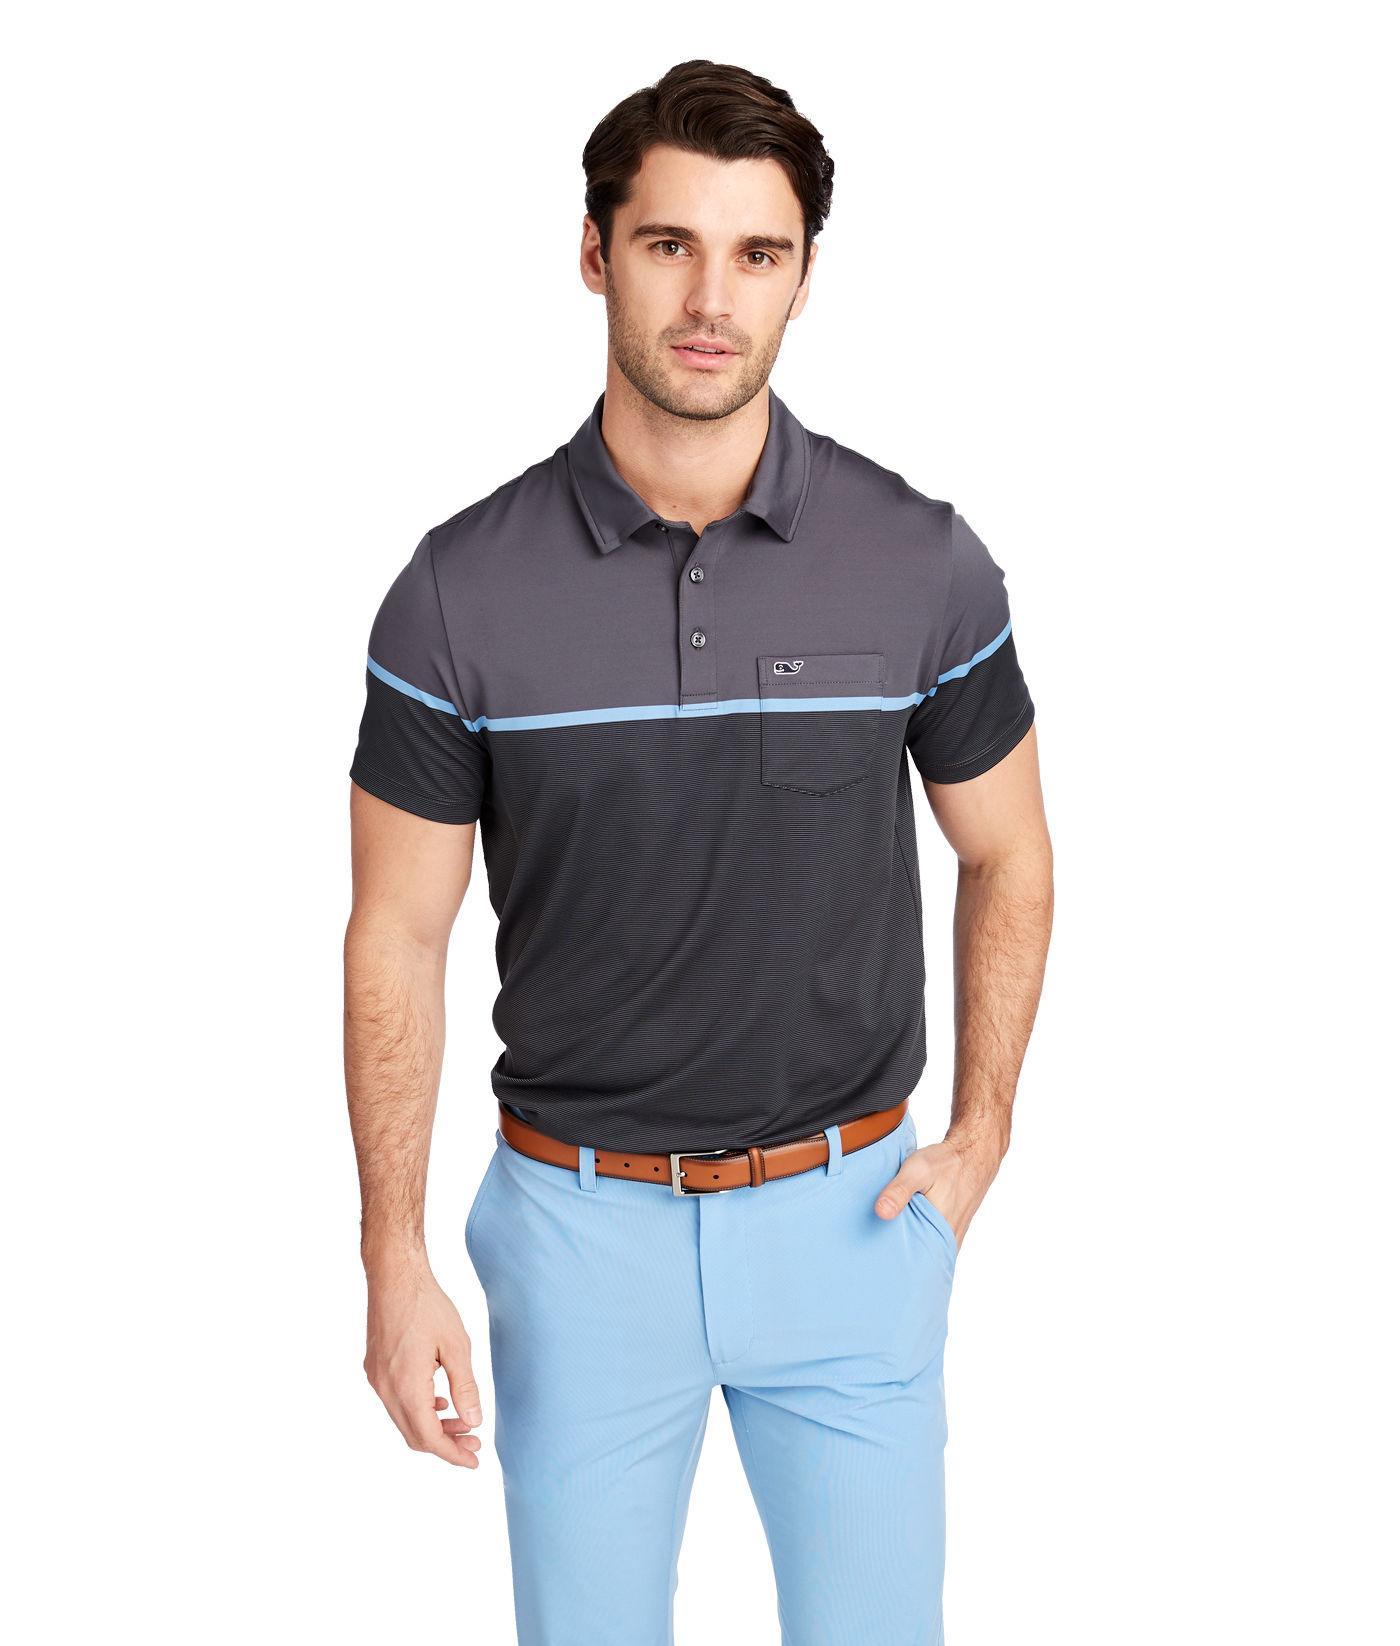 86ba9c6cbe Lyst - Vineyard Vines Caneel Bay Striped Bowline Fit Polo for Men